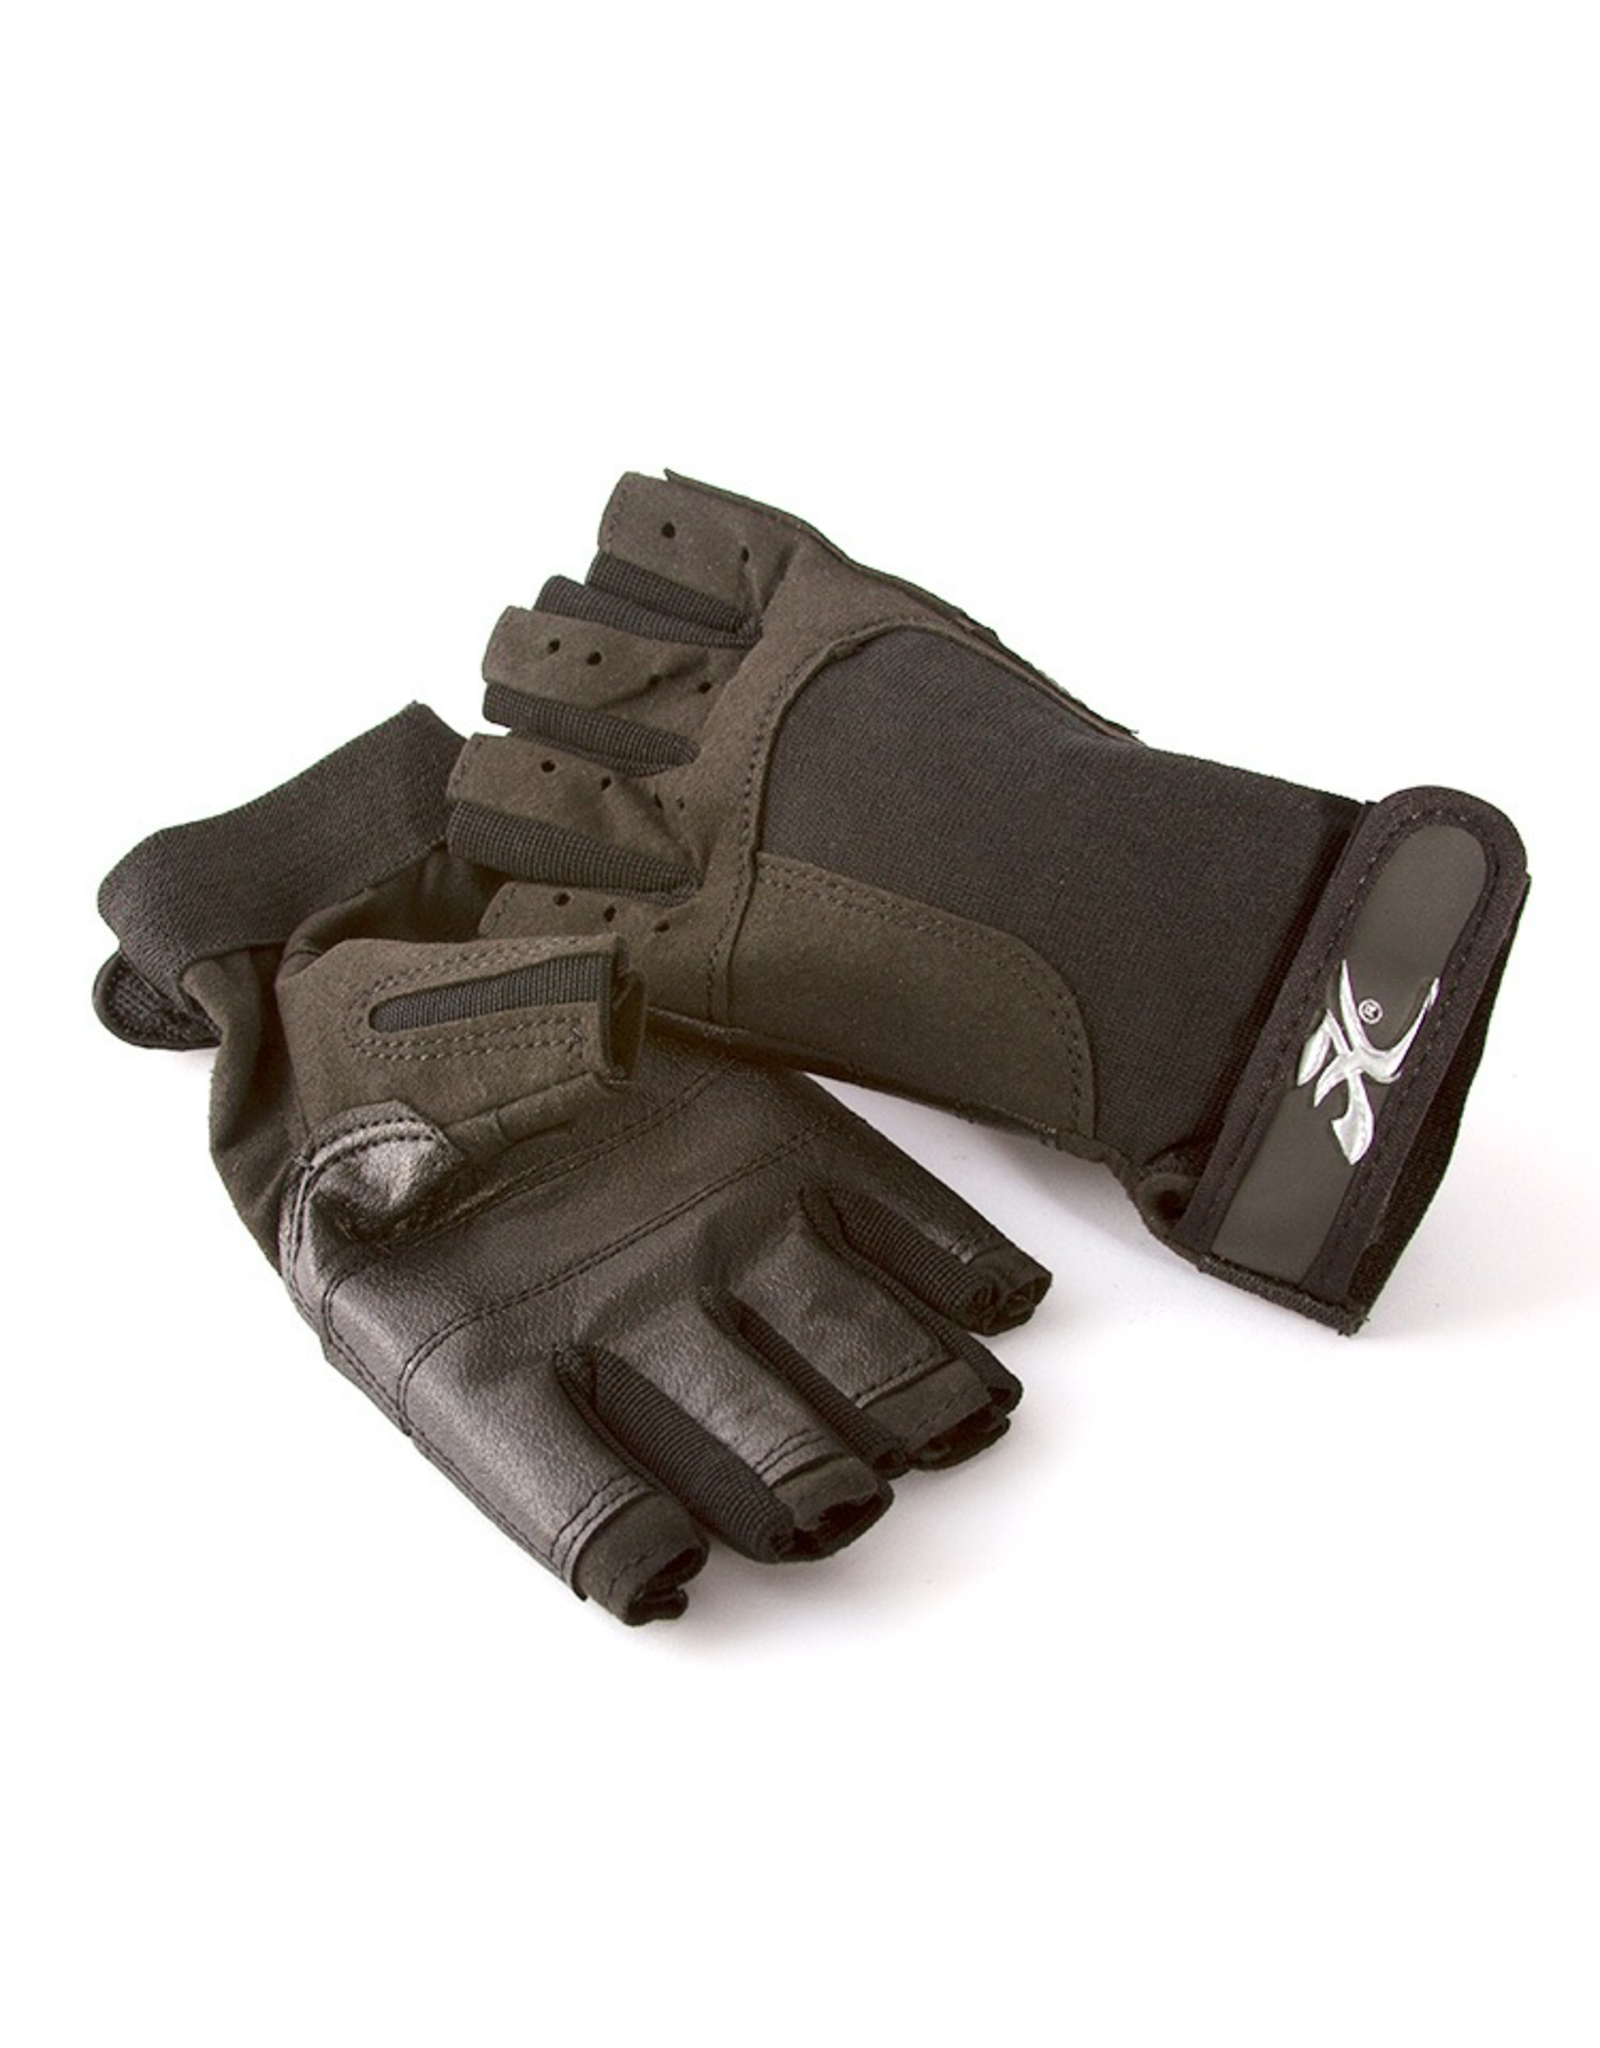 Hobie Hobie Paddleing/Sailing Gloves, Fingerless, Black, XL